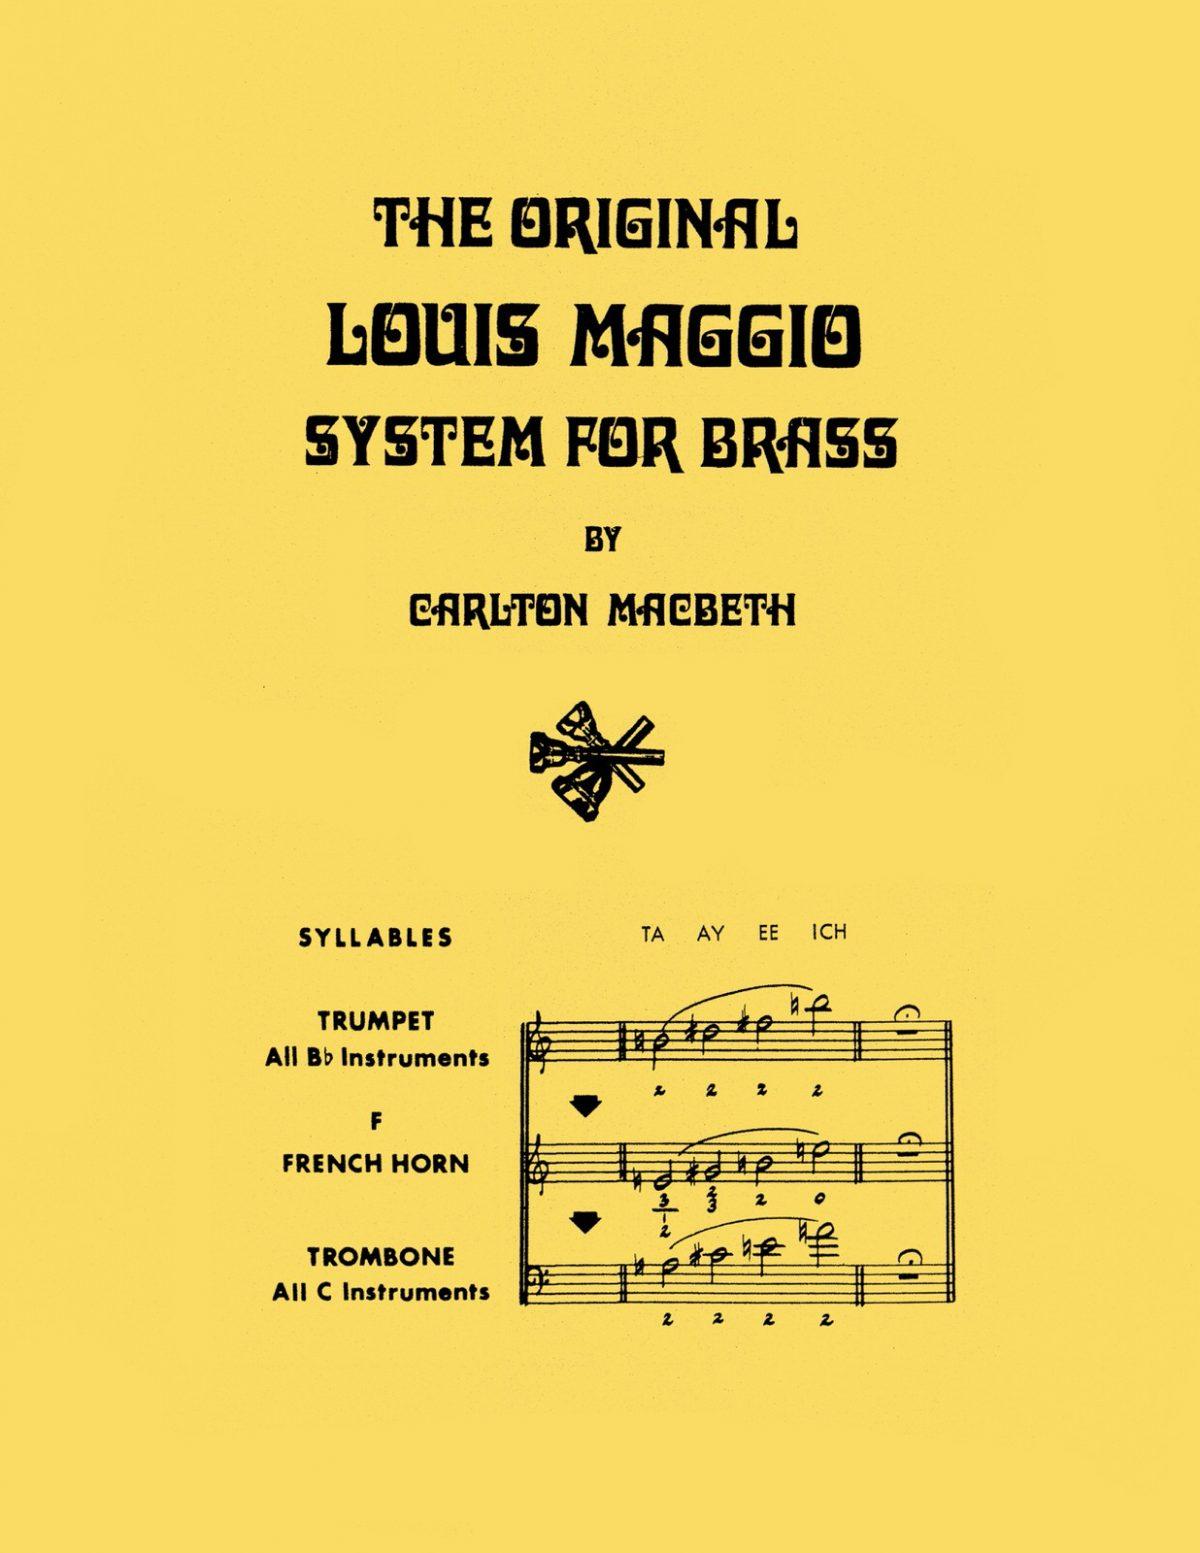 Macbeth, The Original Louis Maggio System for Brass-p001